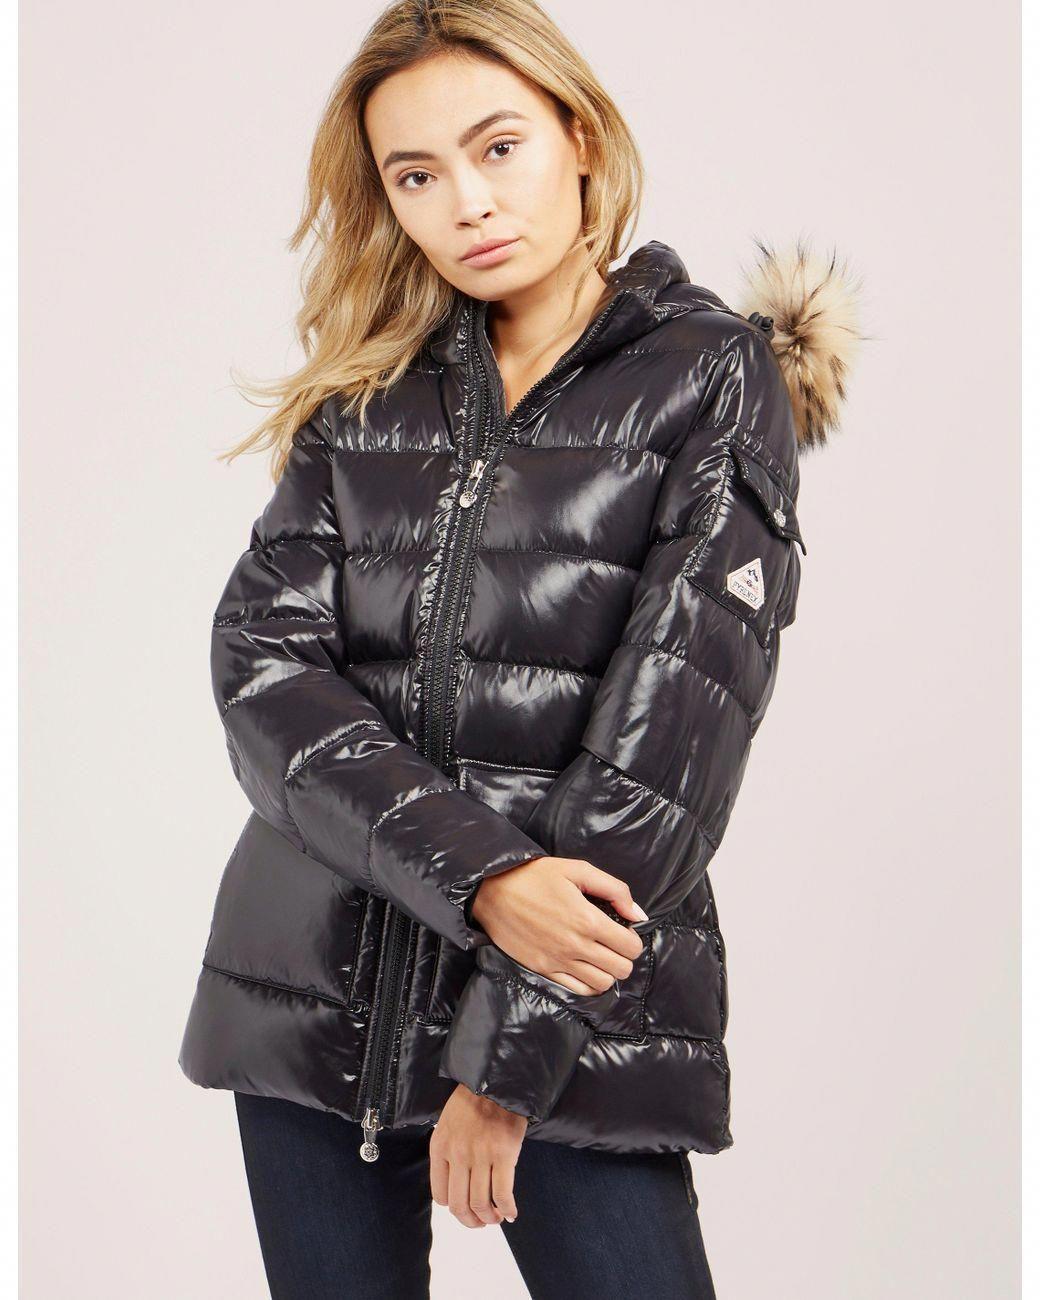 f892230cc Pyrenex   Black Authentic Shiny Jacket   Lyst #Women'scoats ...